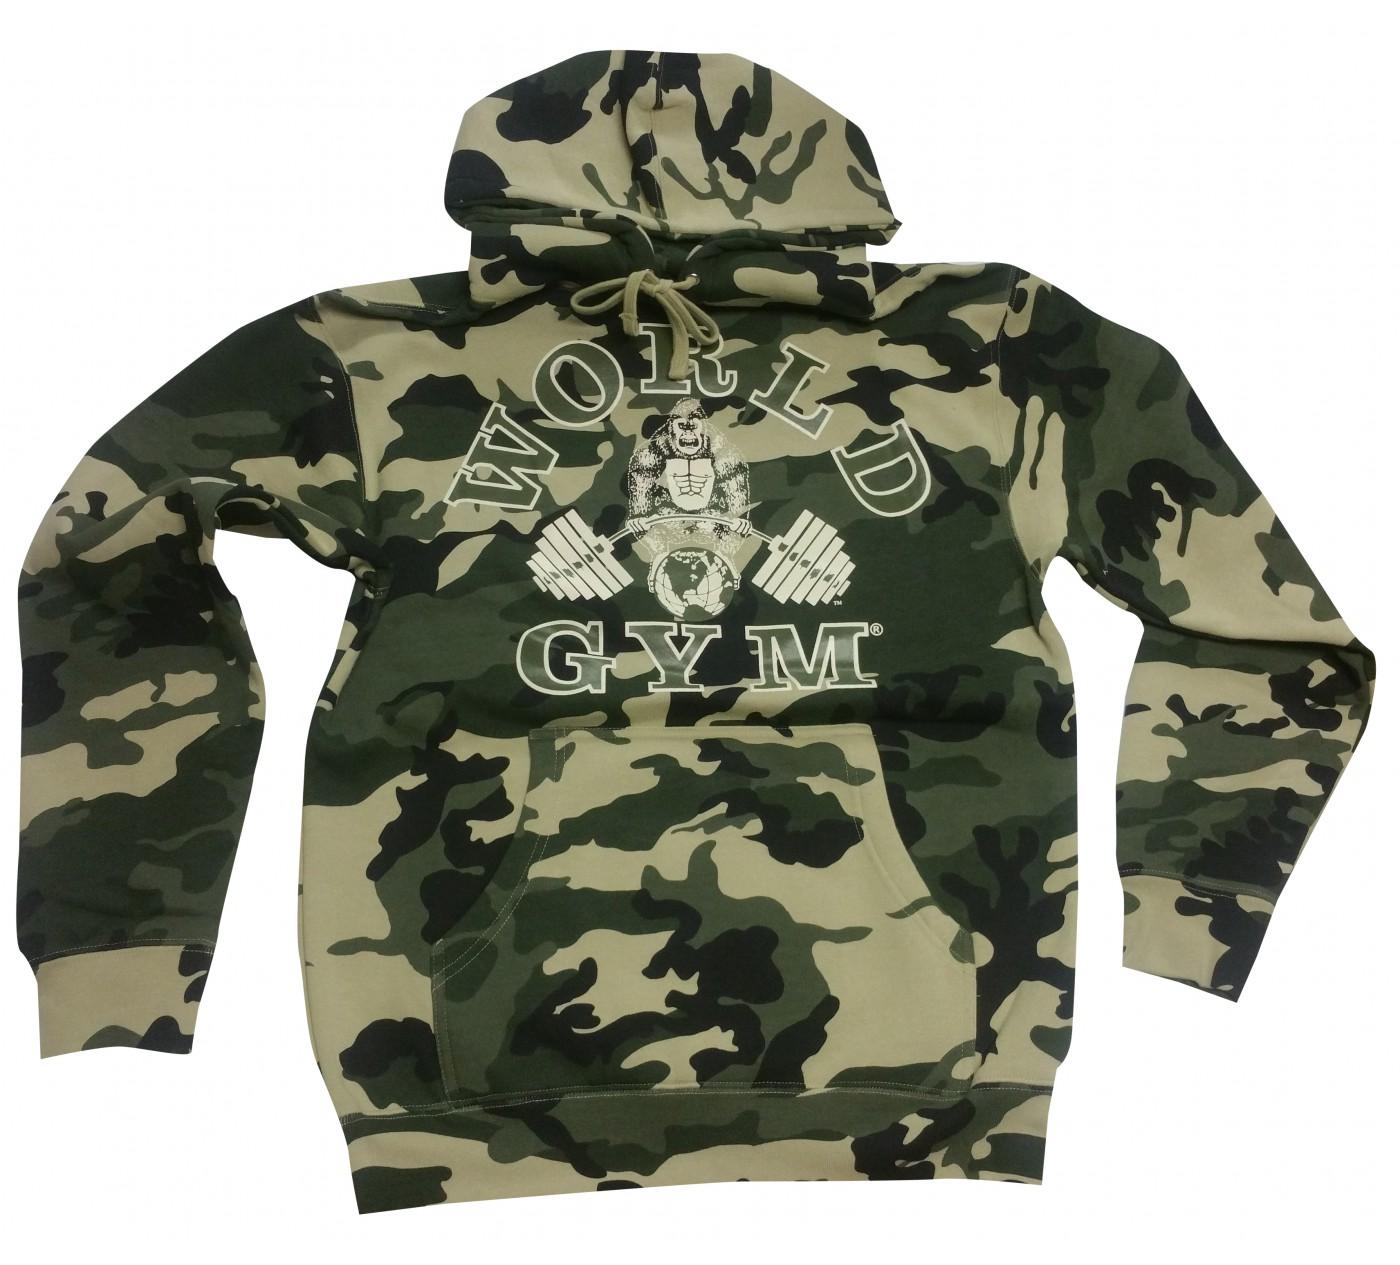 World Gym Camo Hoodie Muscle Gorilla logo camouflage